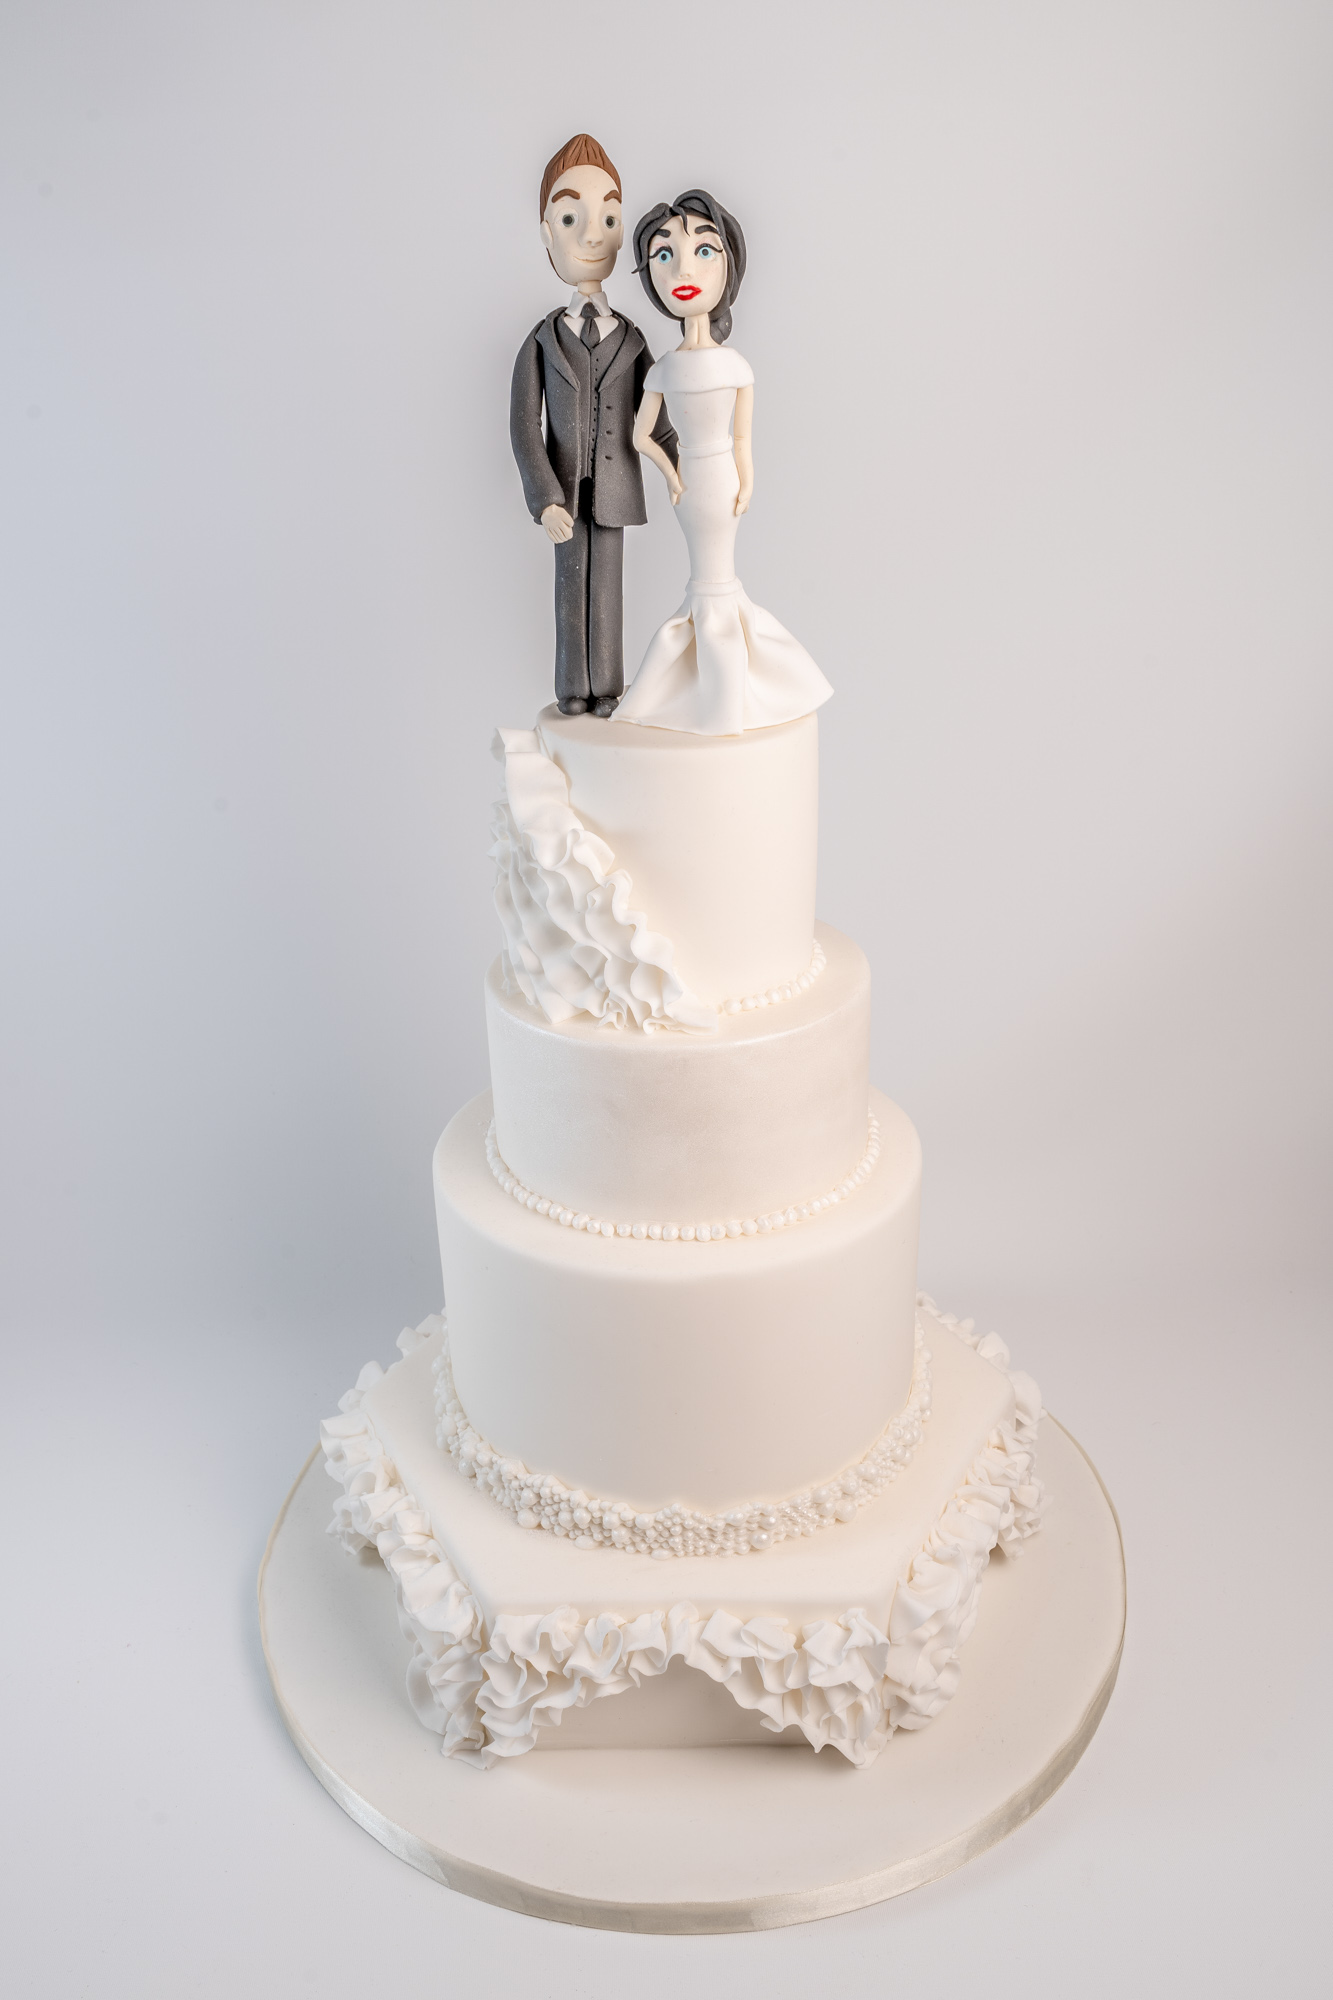 4 Tier pure white wedding cake